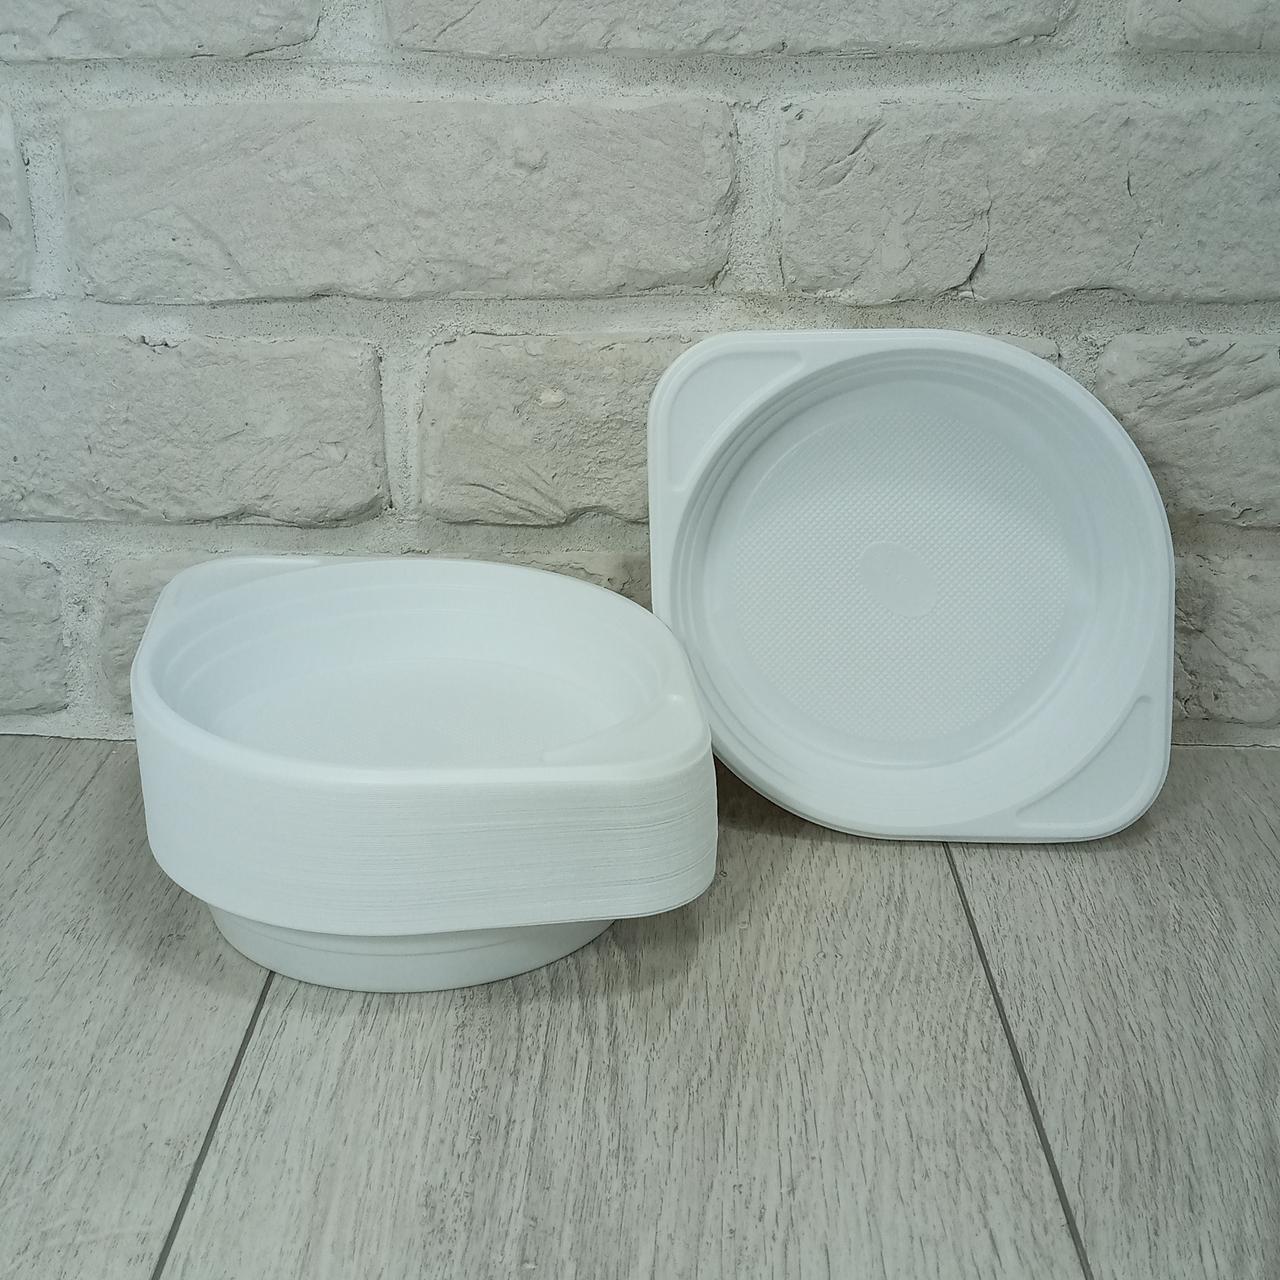 Тарелка пластиковая одноразовая 350гр Андрекс 100 шт